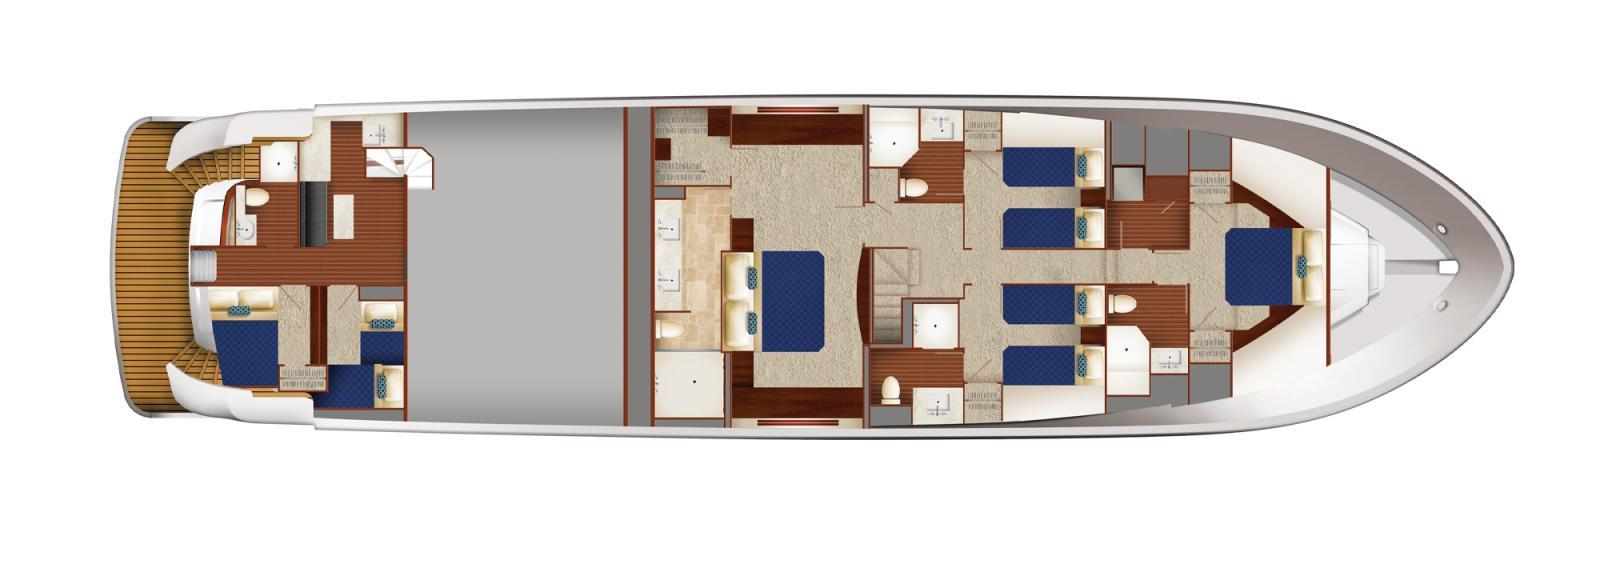 First Hatteras 90 Motor Yacht Under Construction